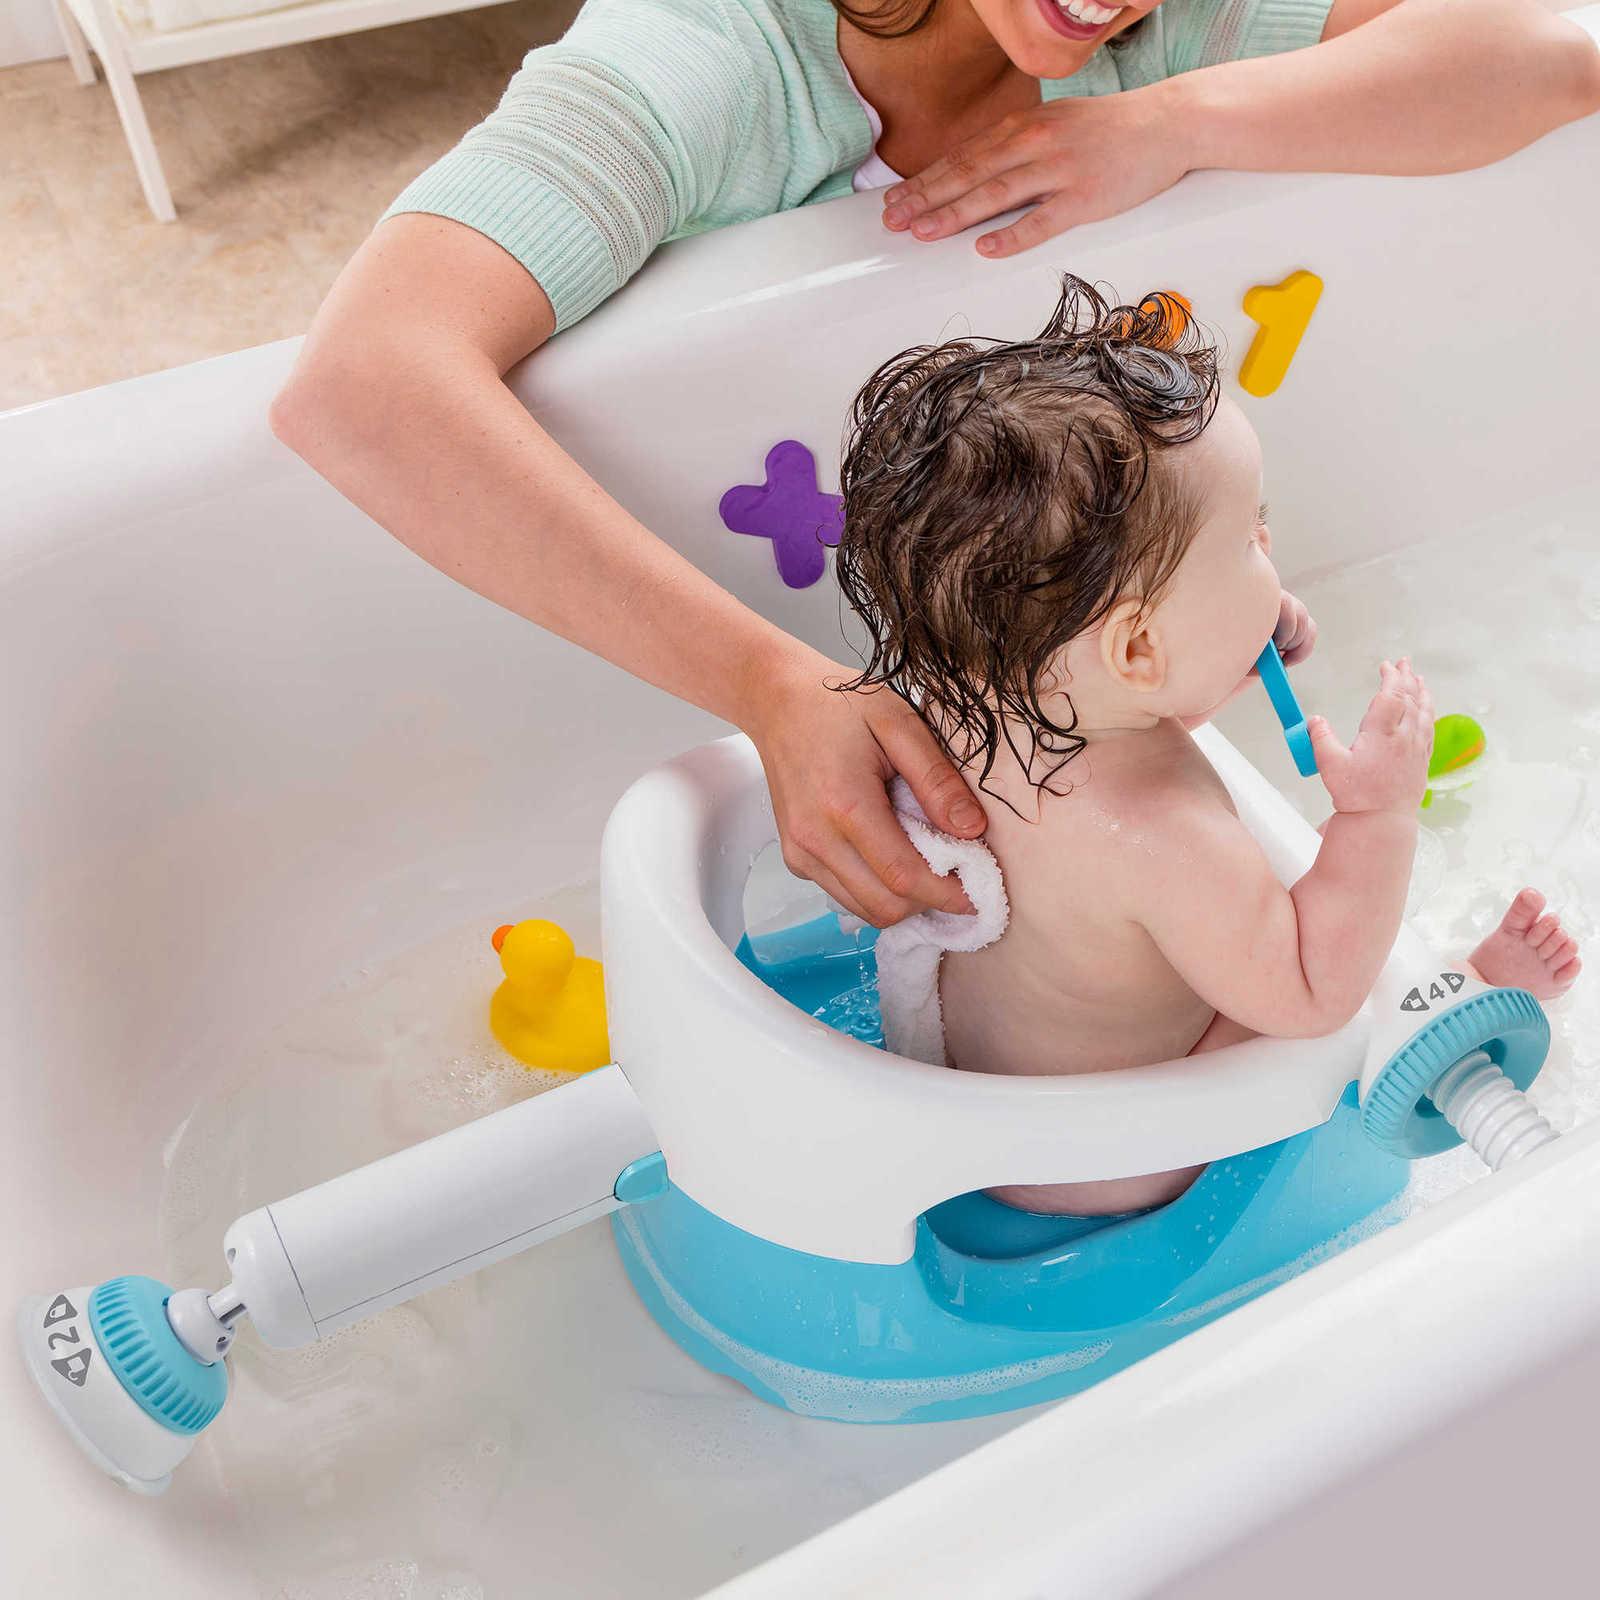 Baby Infant Safe Anti Slip Bath Tub Ring Seat Chair- Bath Tub Seats ...